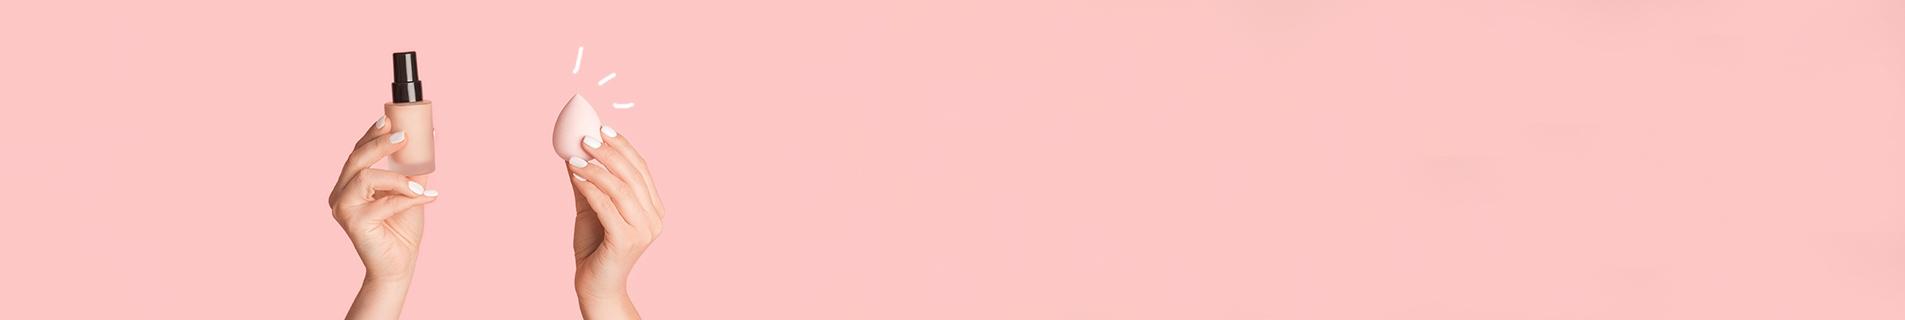 Maquillage de marque pas cher | Blush teint | SAGA Cosmetics